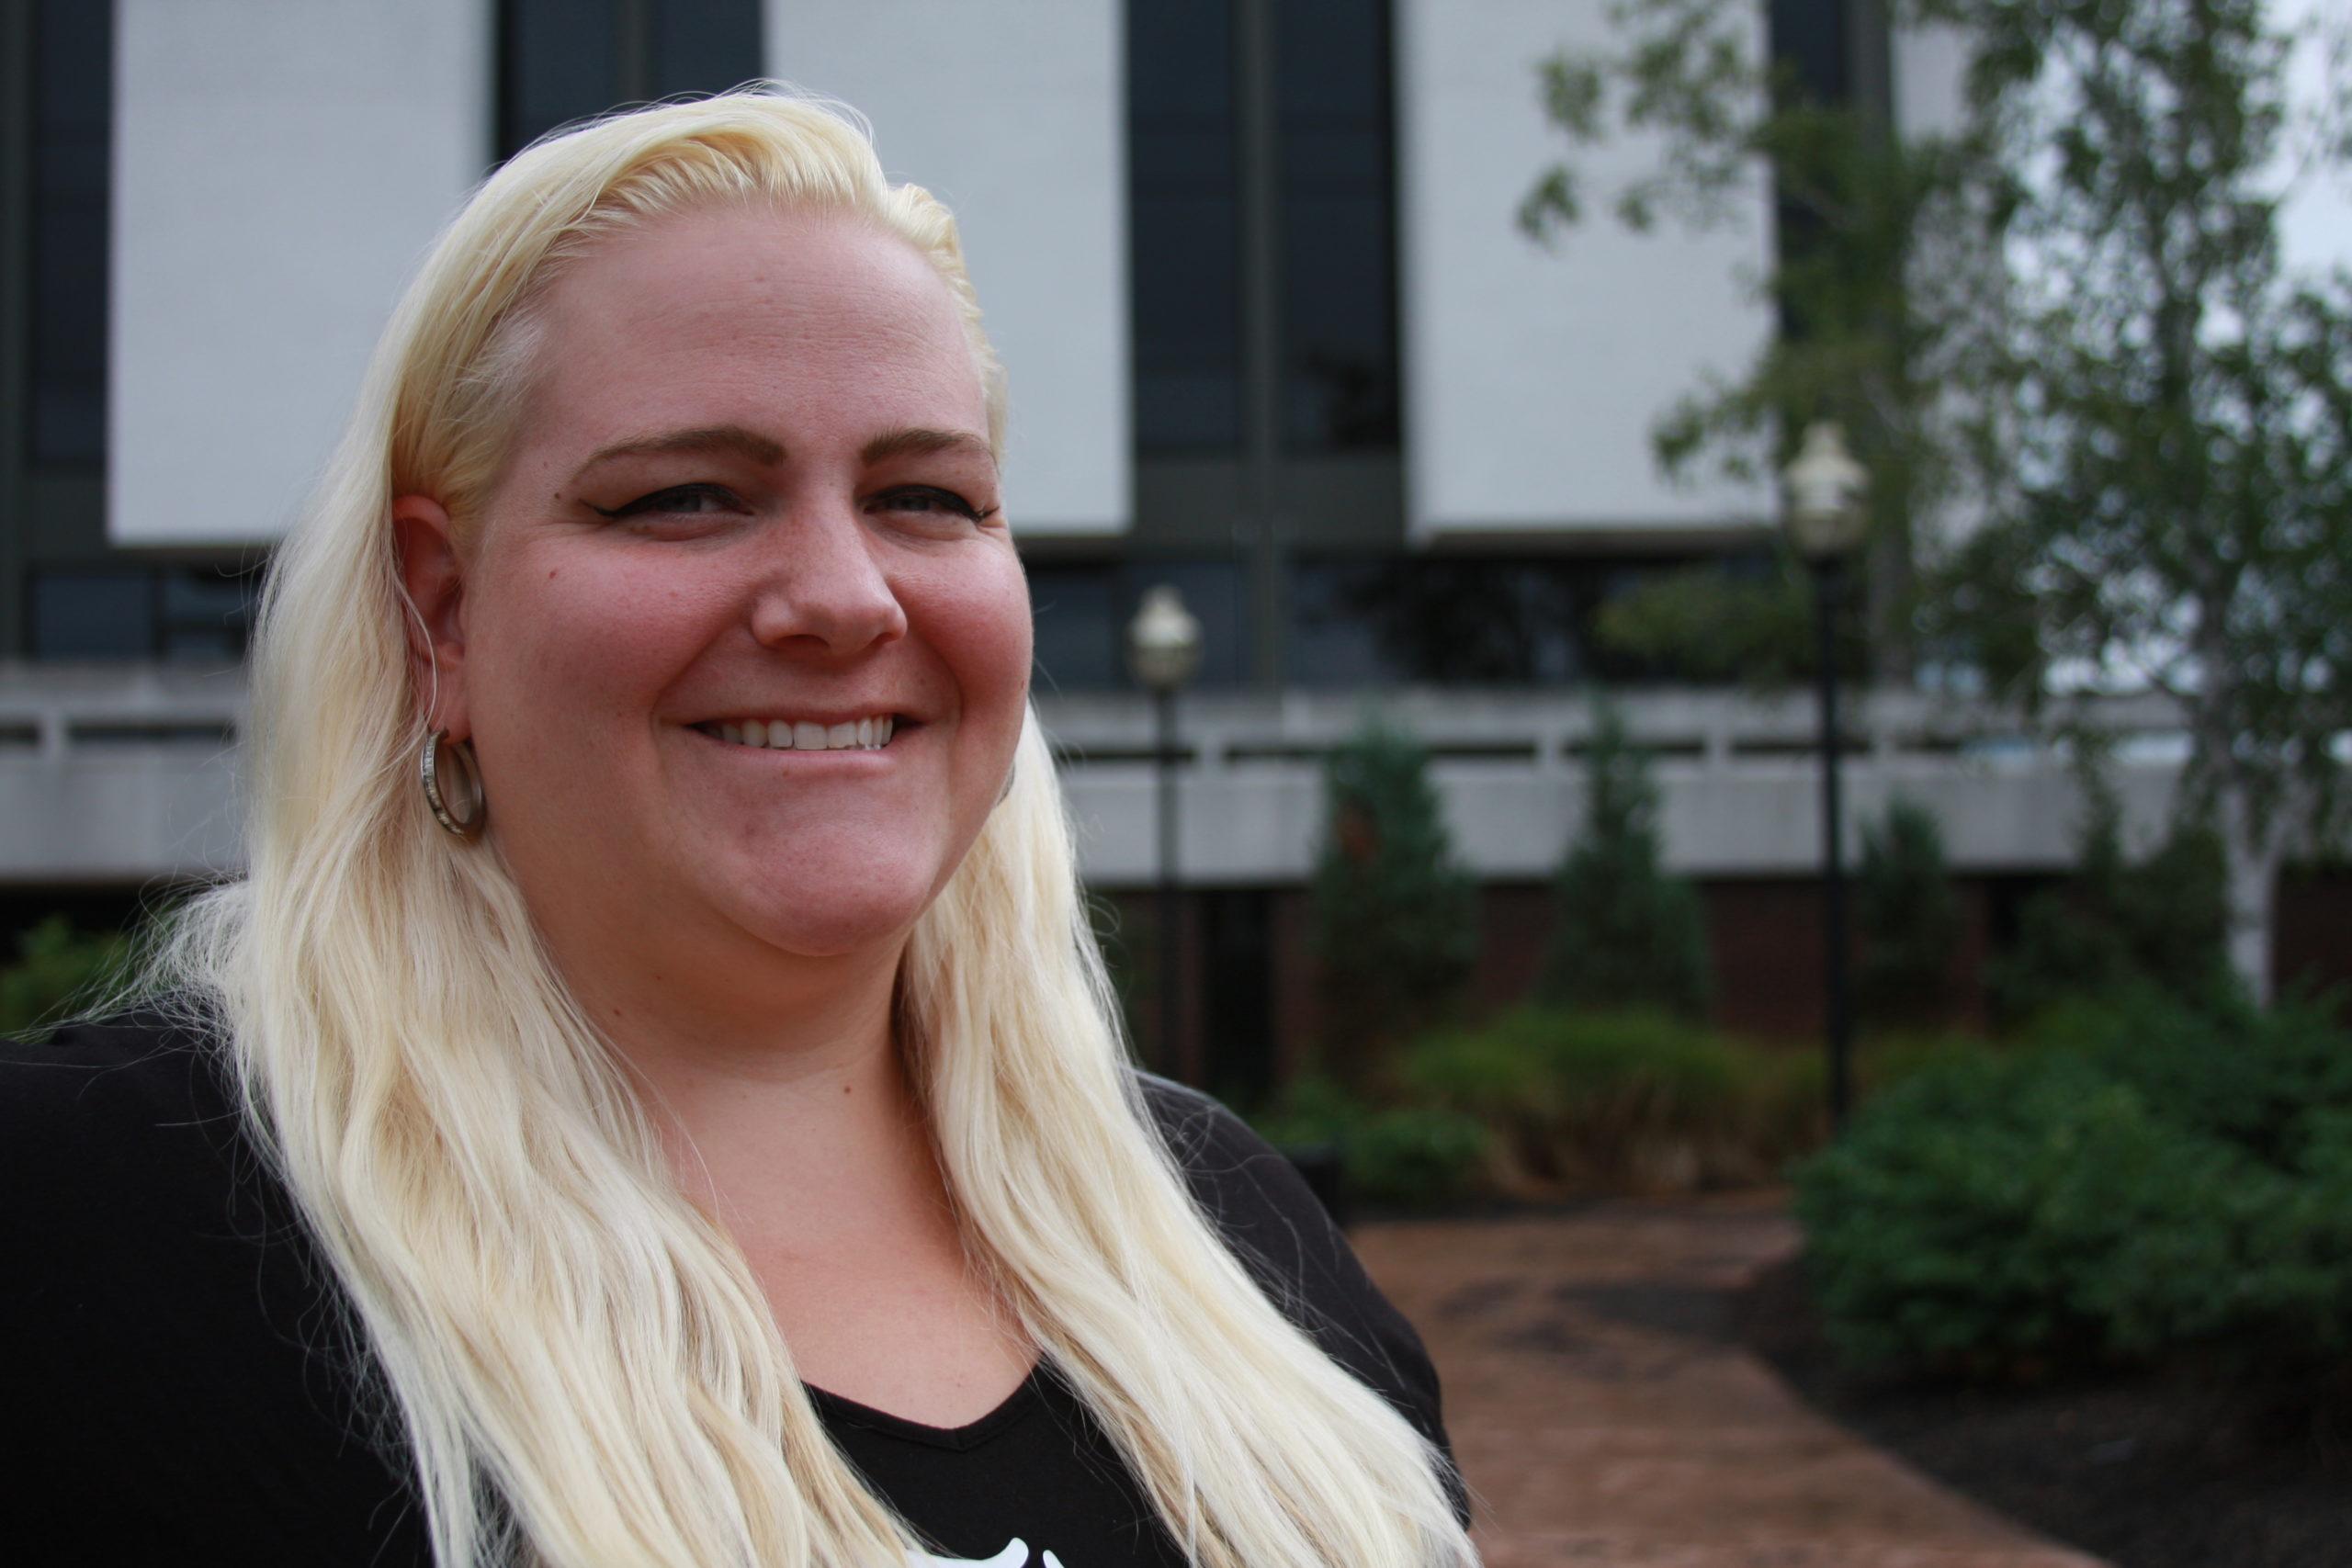 NCCC Student Alisha Rivers